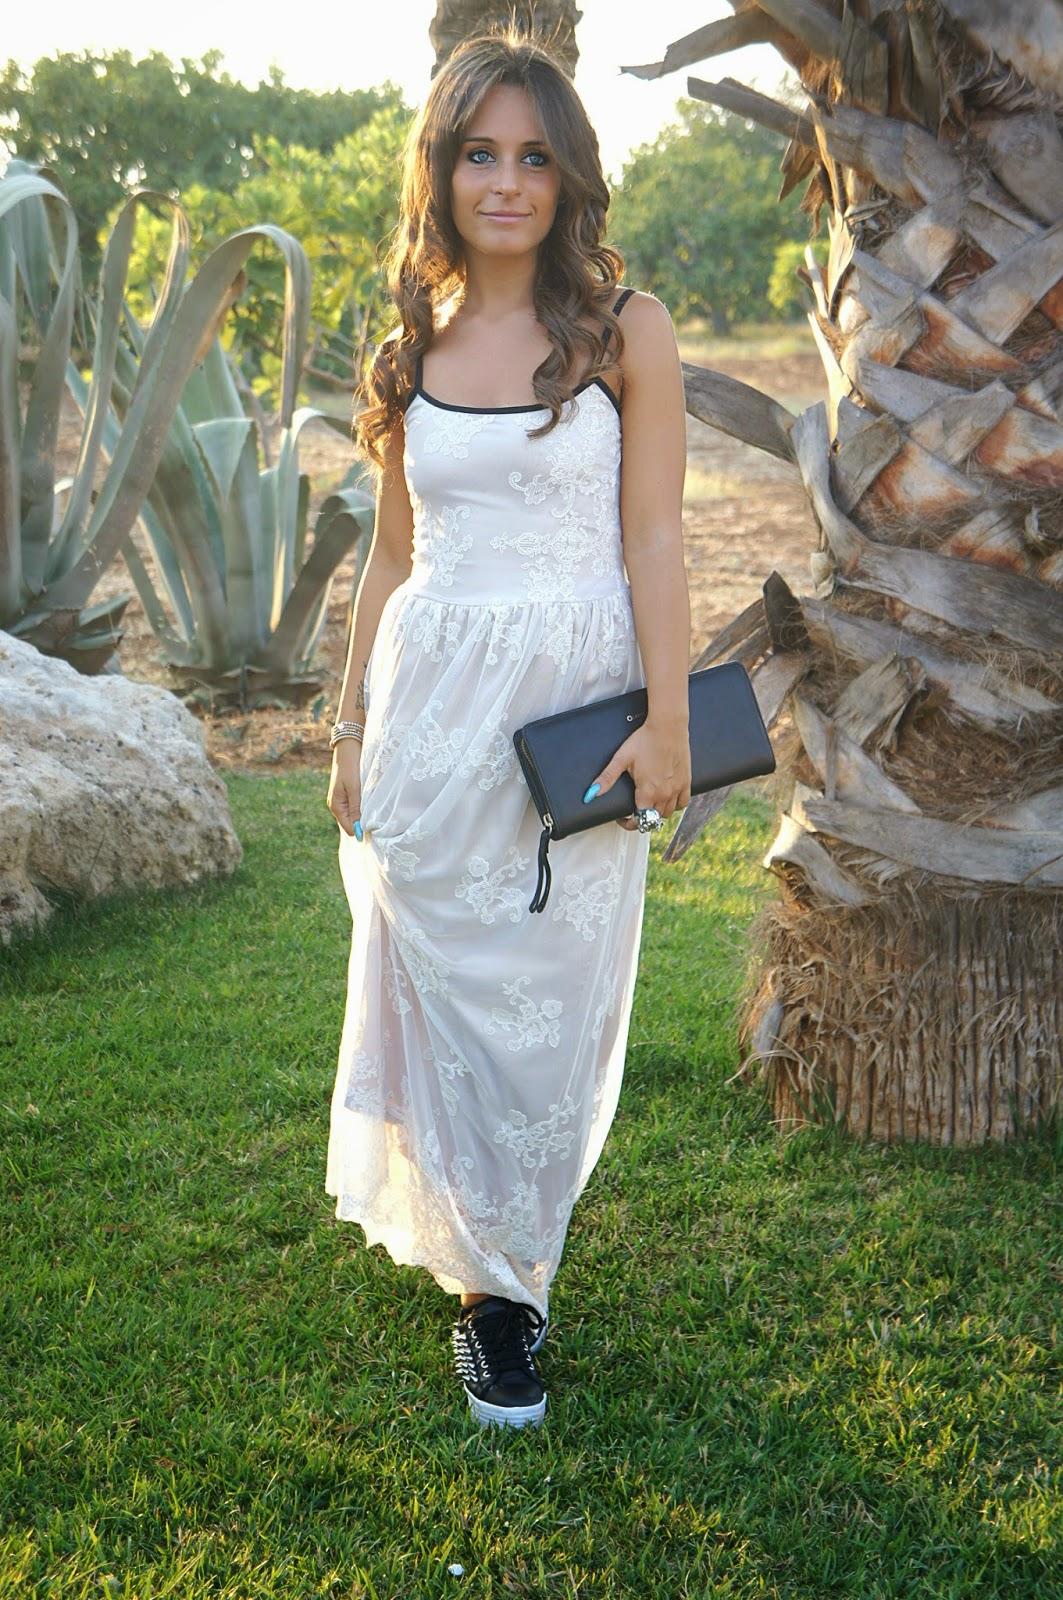 0458f6b391 So Allure white dress & JC Zomg shoes - Inside Me